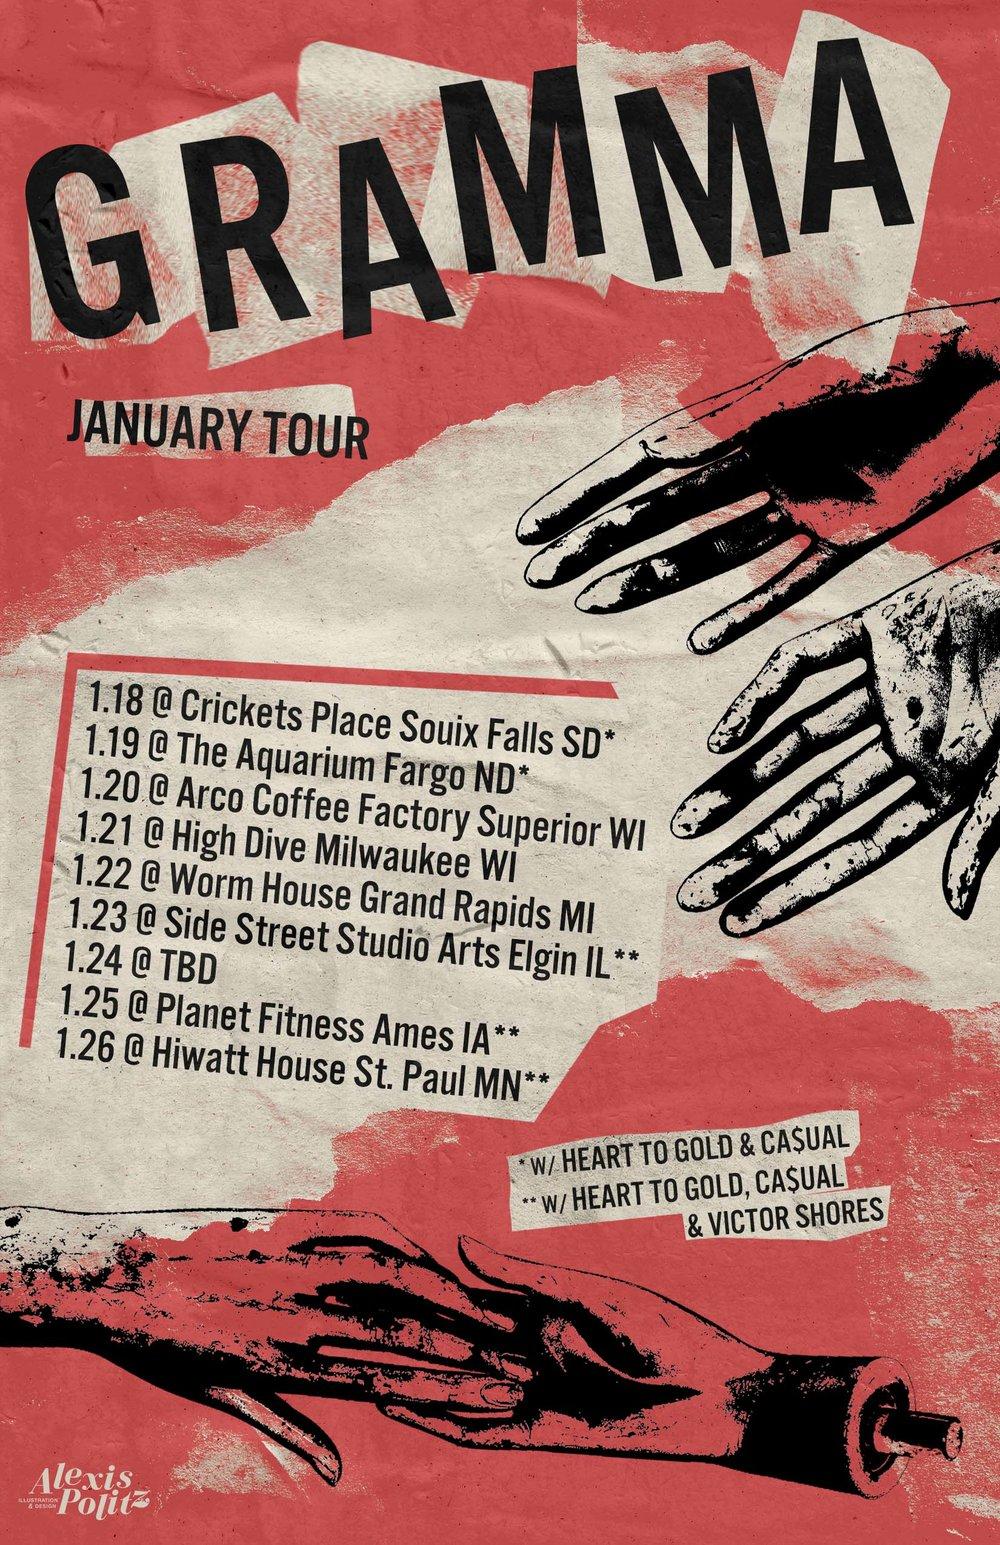 Gma.Tour.jpg